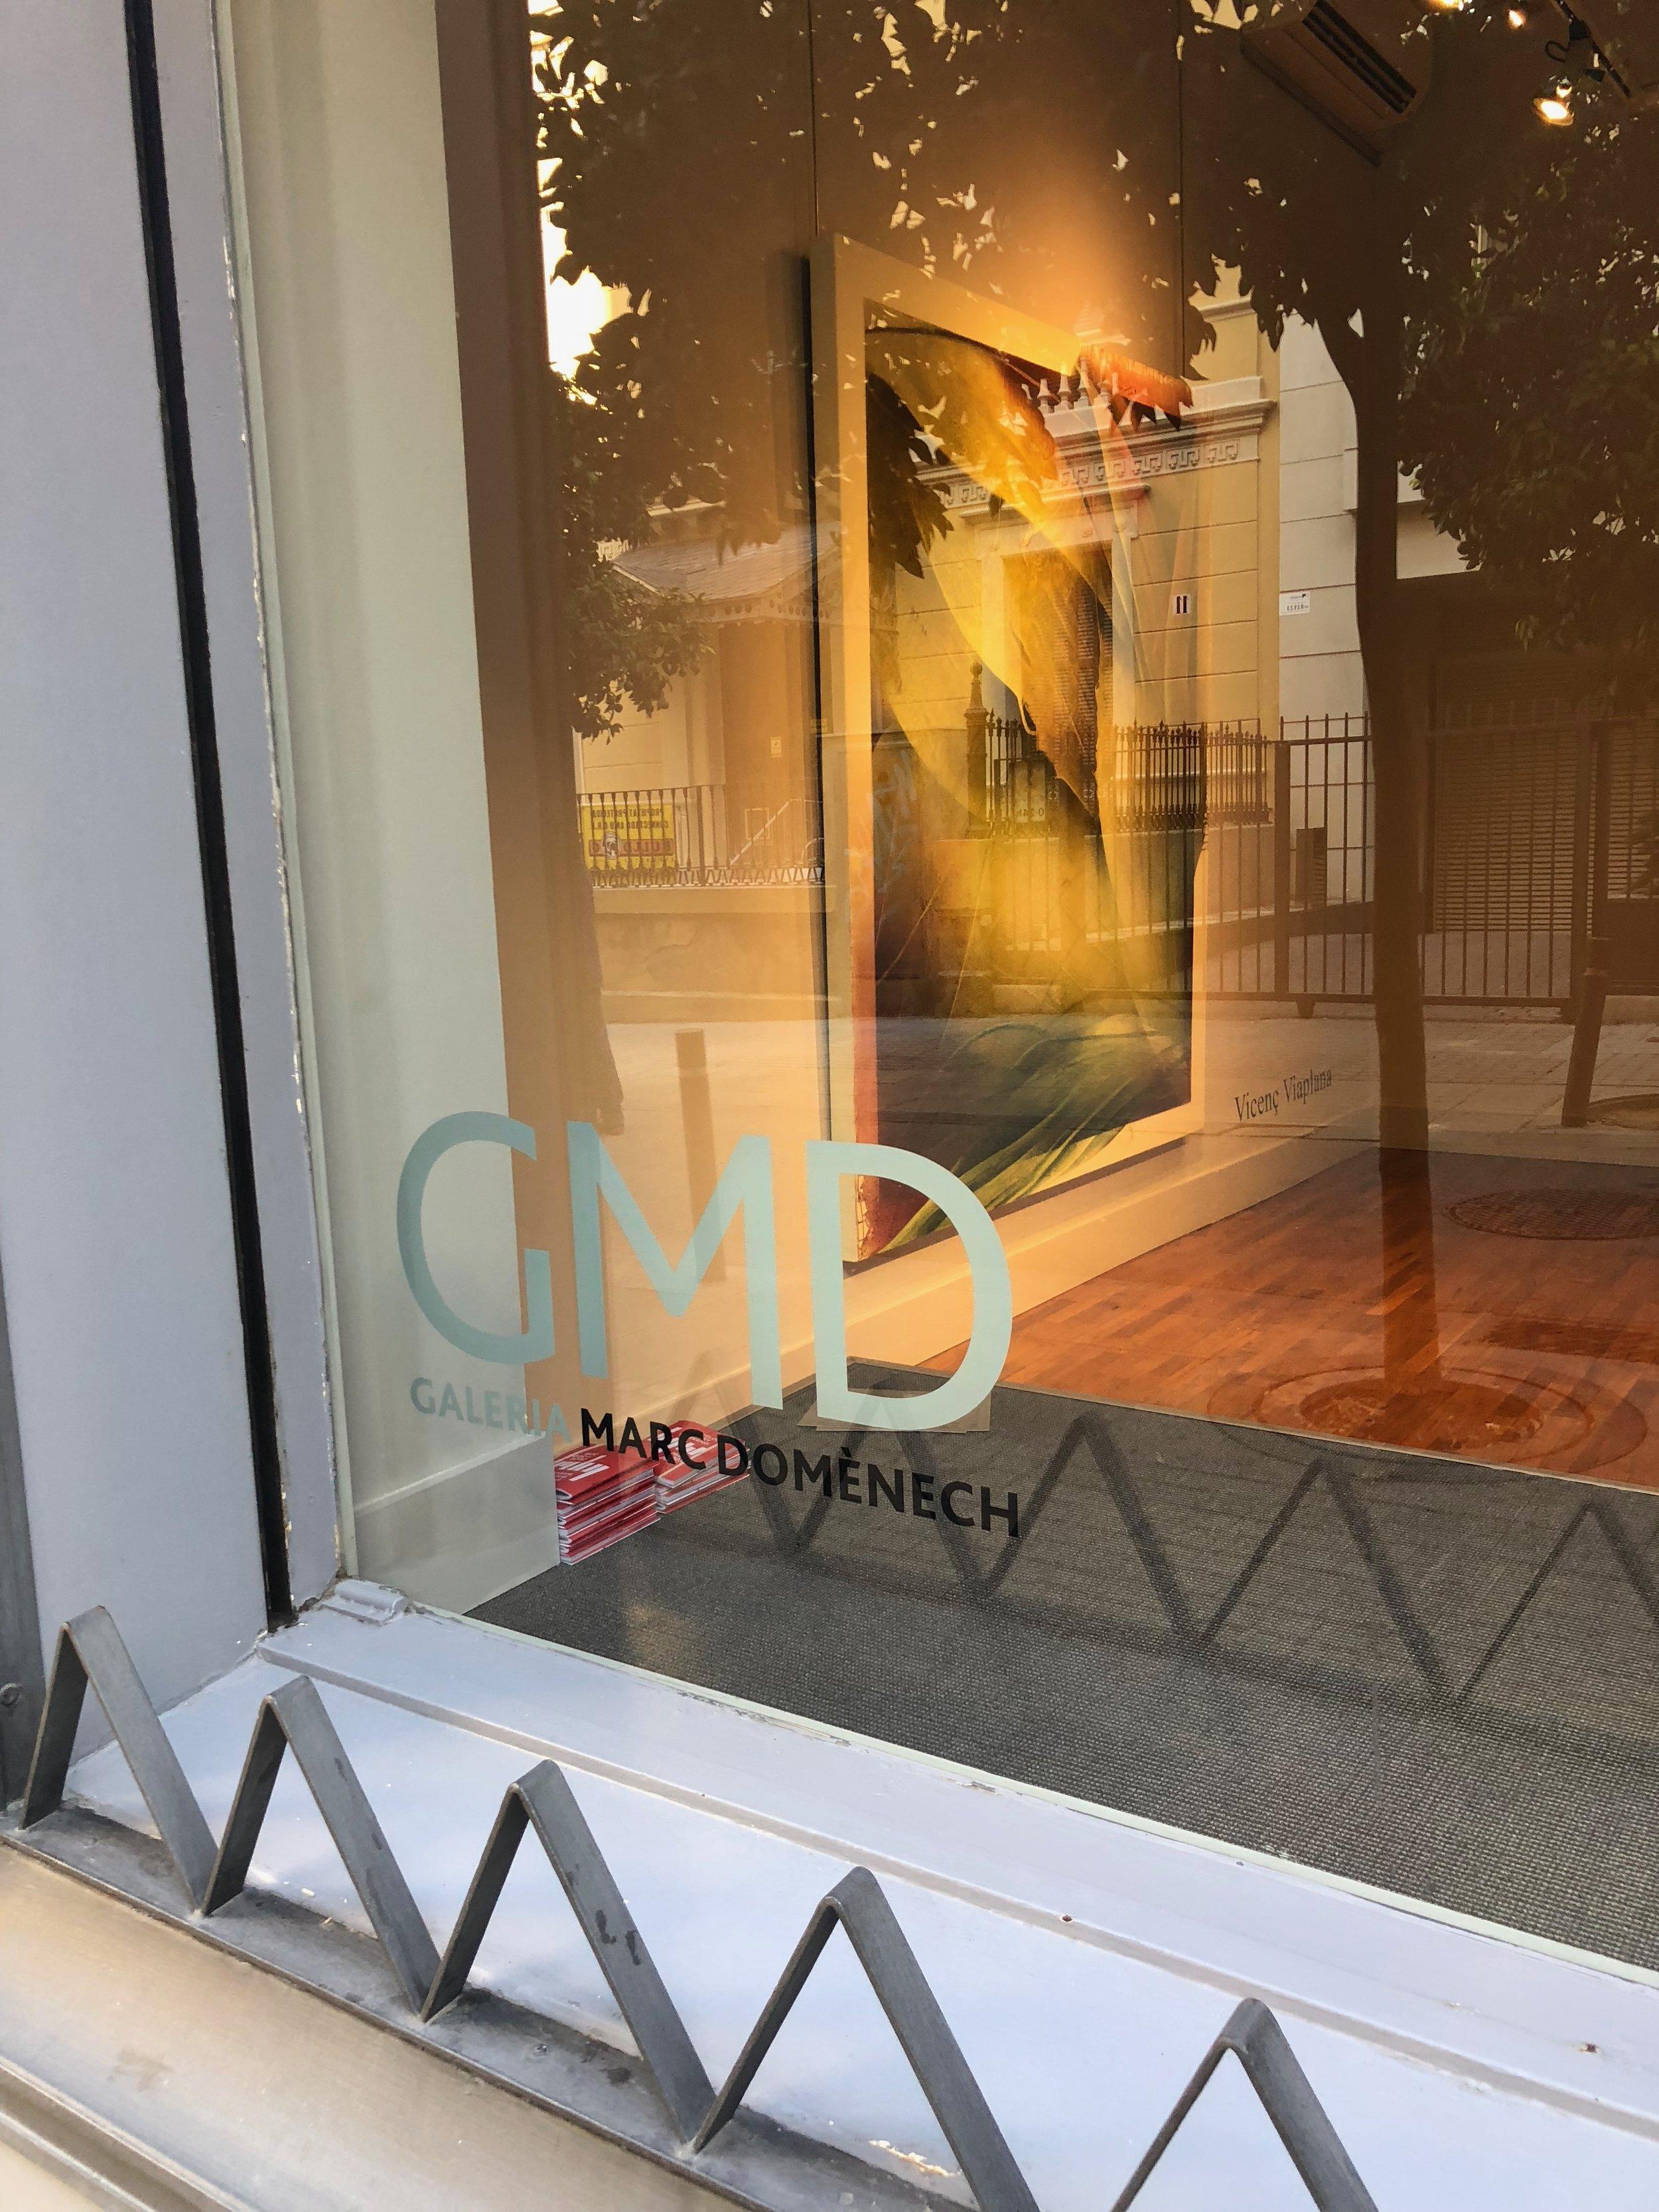 Galleria Marc Domenech - GMD